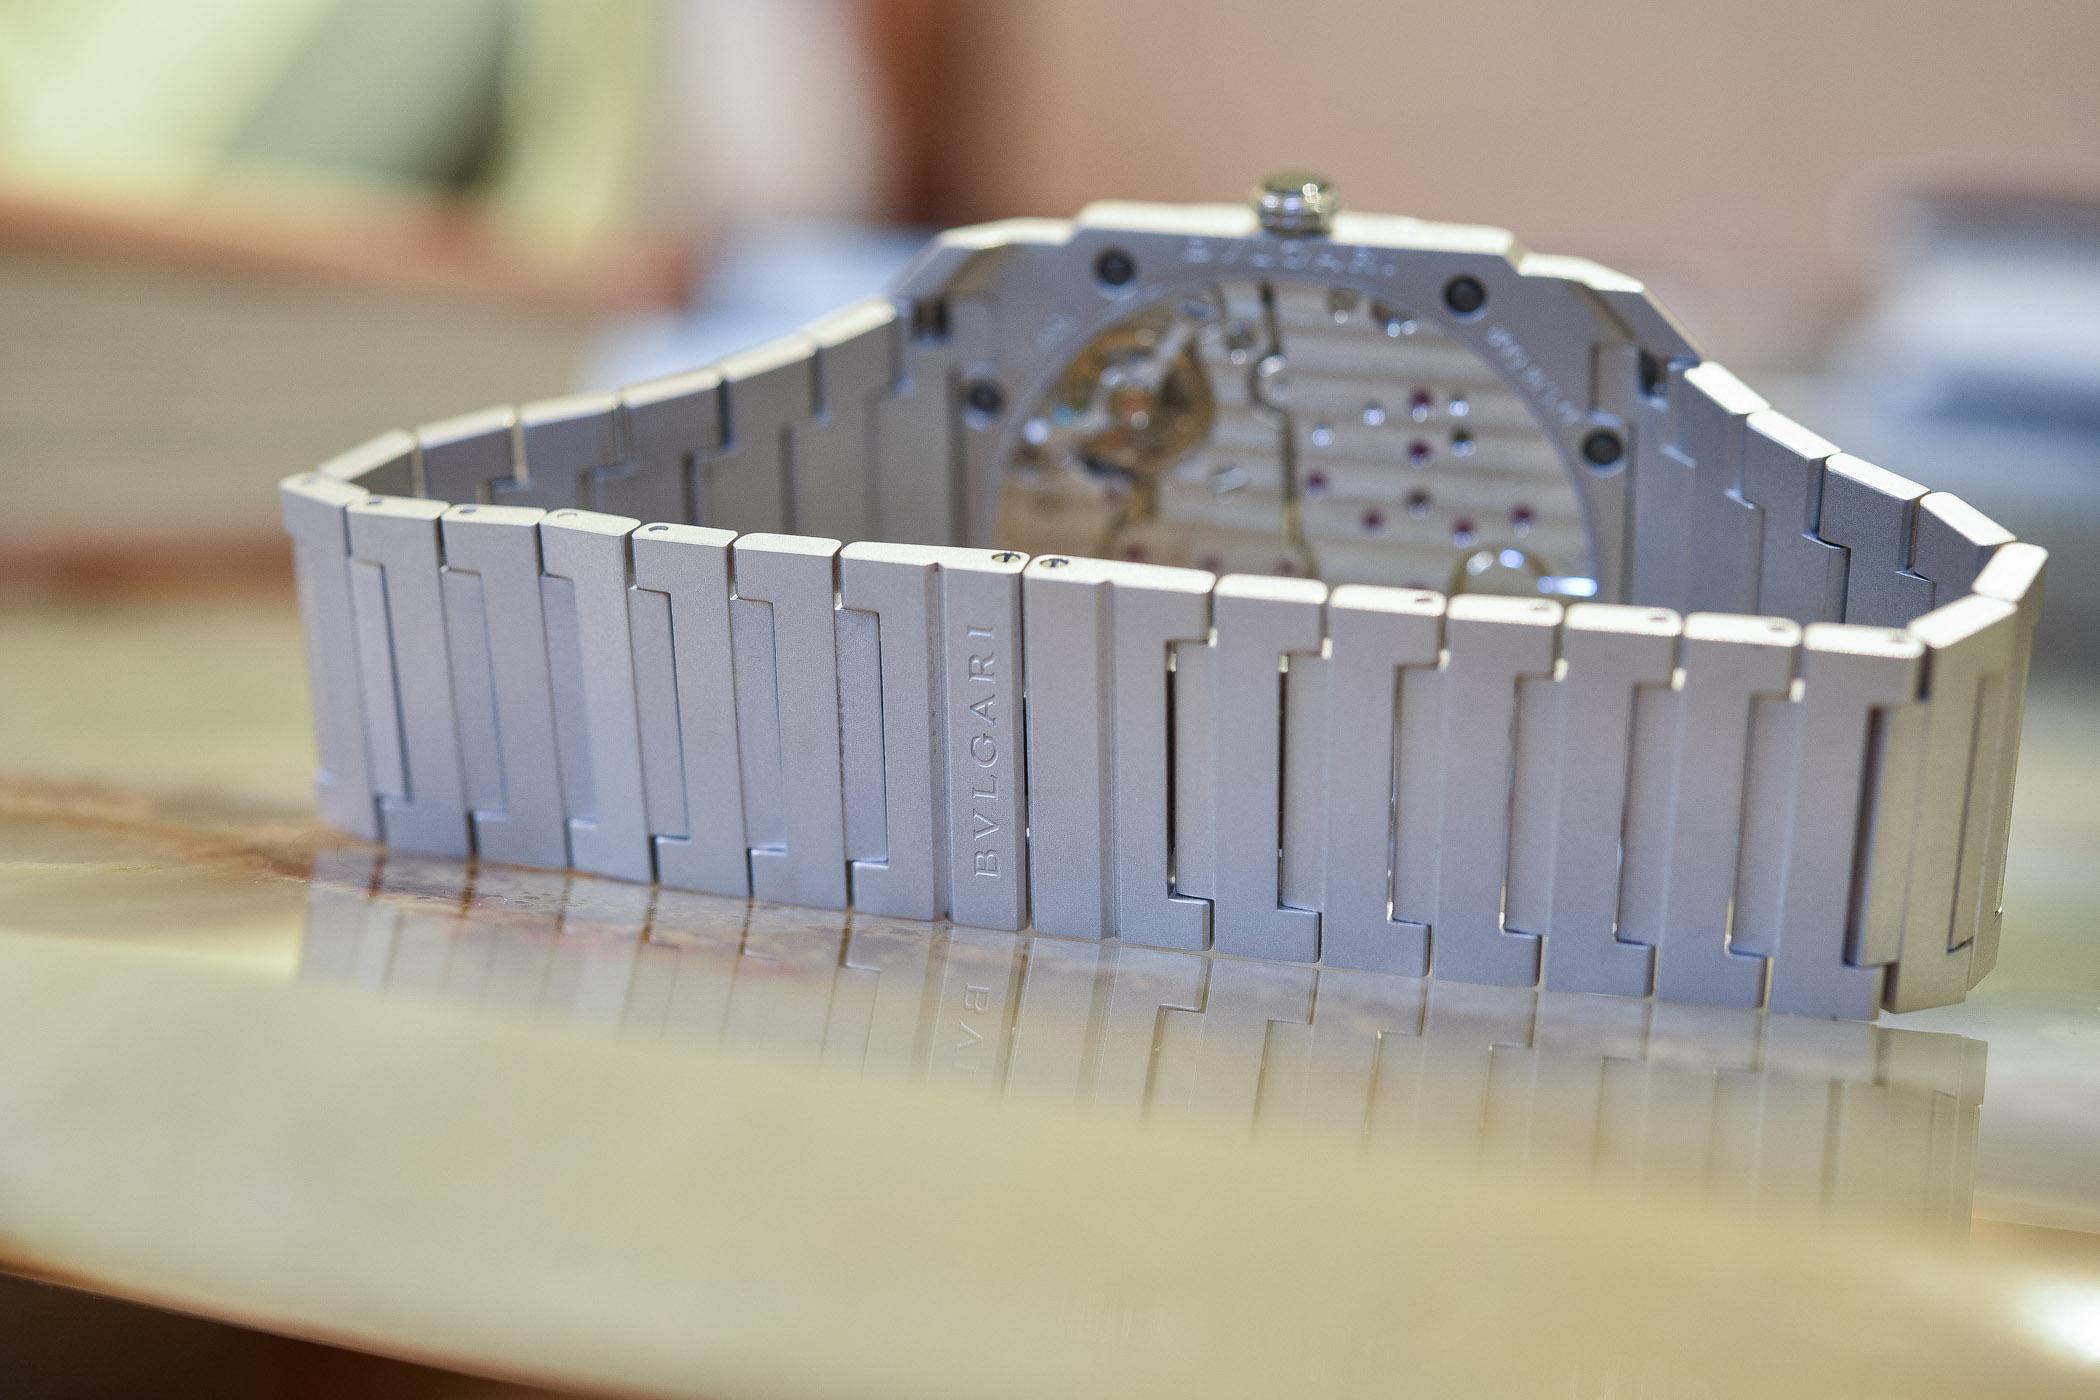 Bulgari Octo Finissimo Automatic Sandblasted Steel